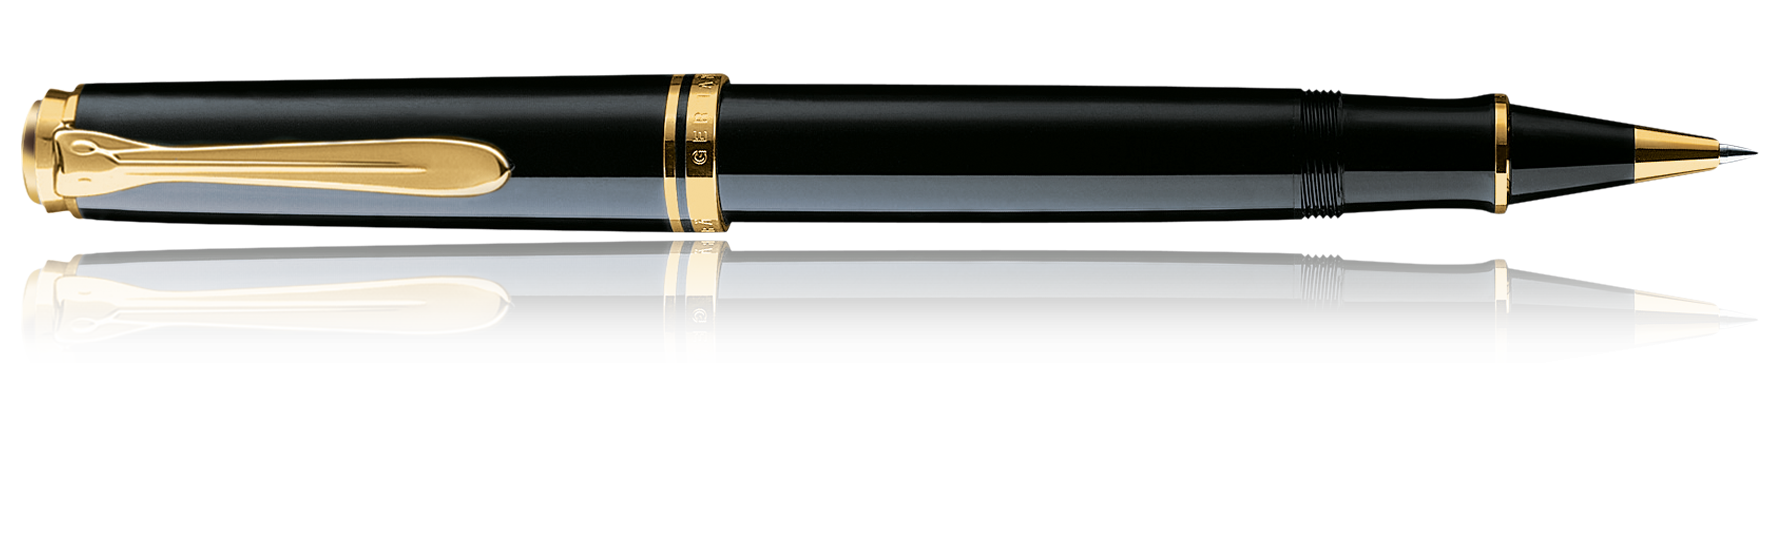 Pelikan Souverän R400 Black Rollerball Pen